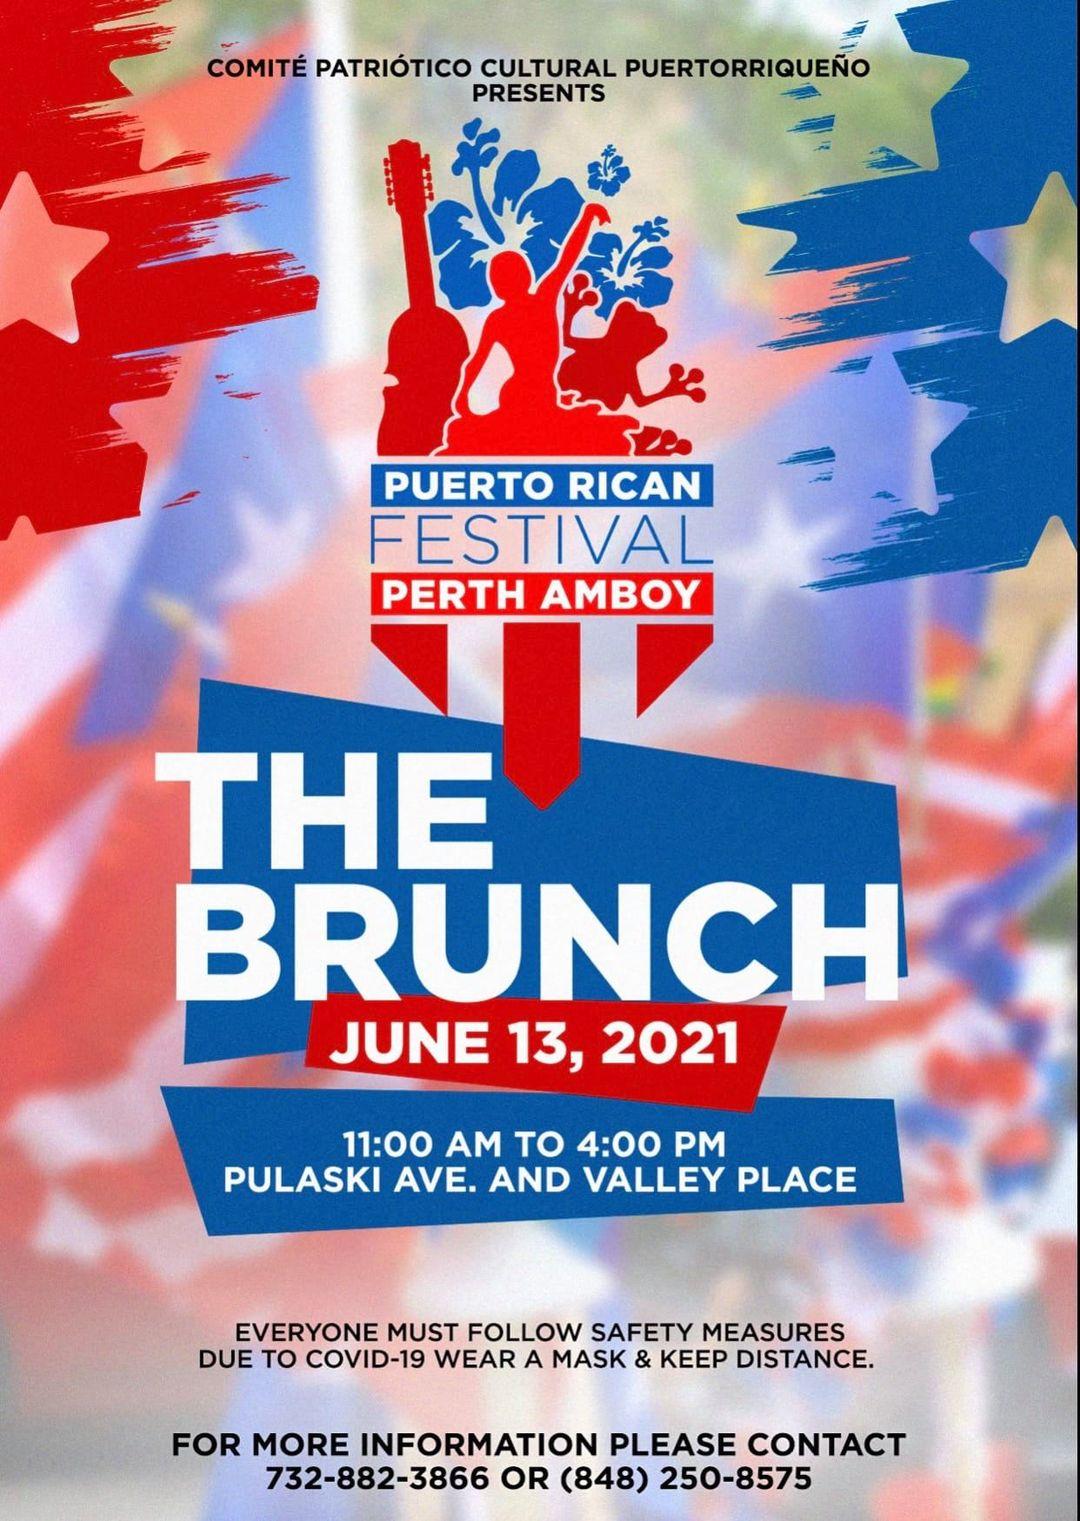 Perth Amboy Puerto Rican Festival 2021